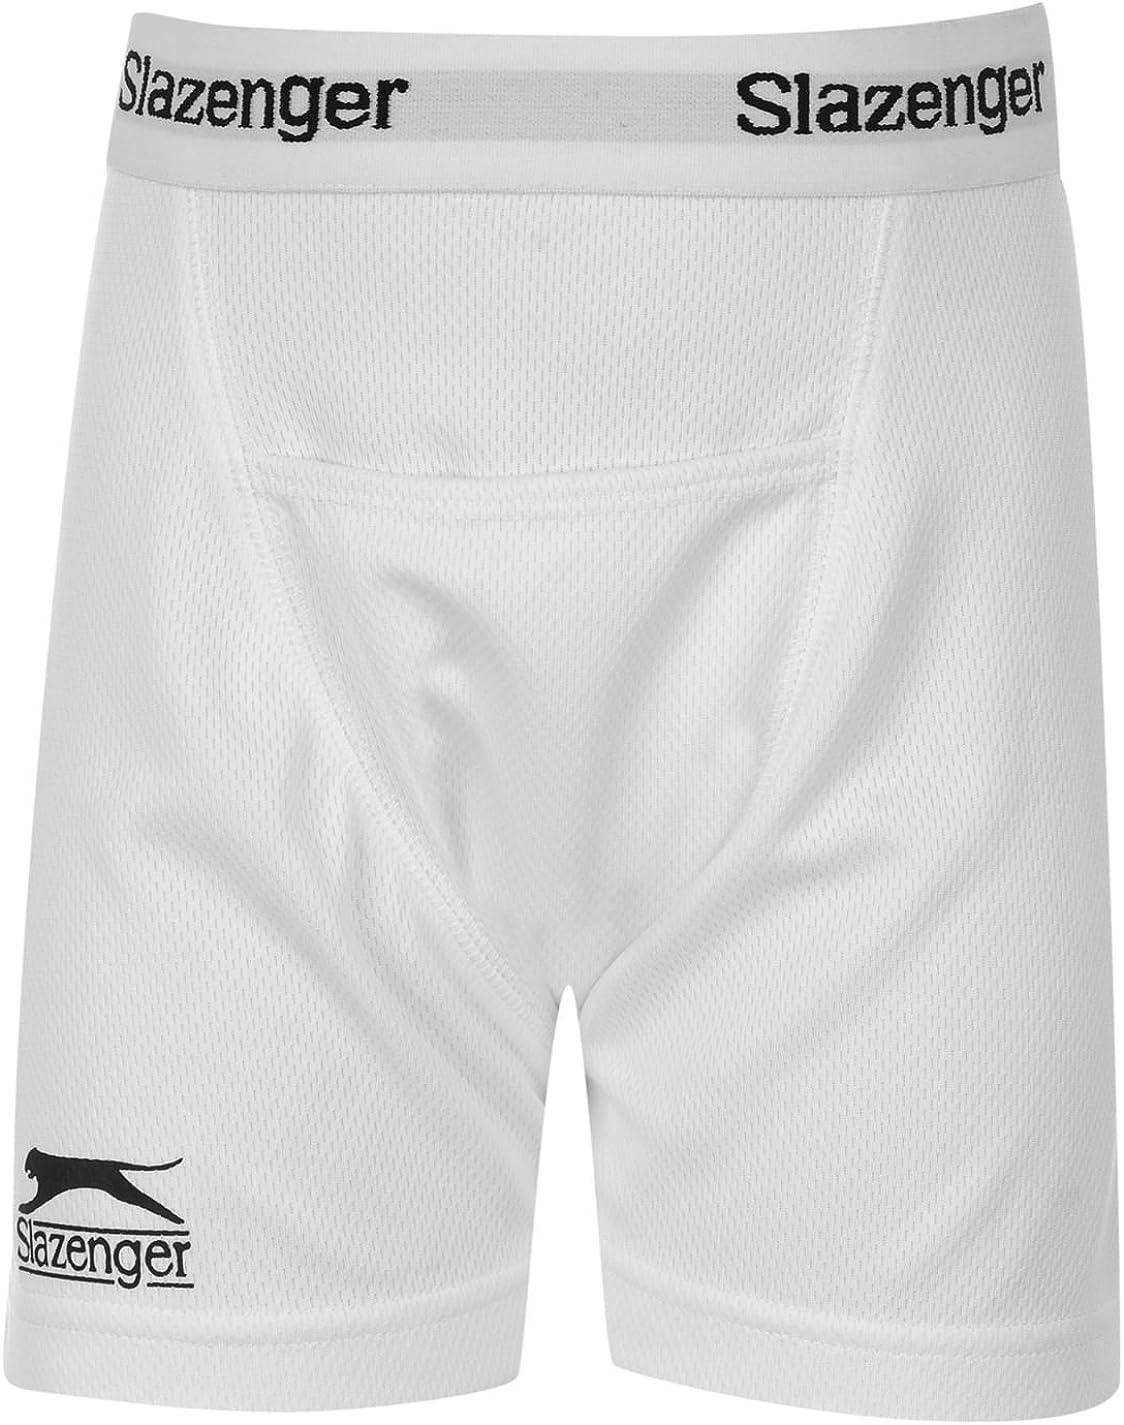 New In Original... Waist Size 29//30 Inch Slazenger Youths Cricket Jock Strap